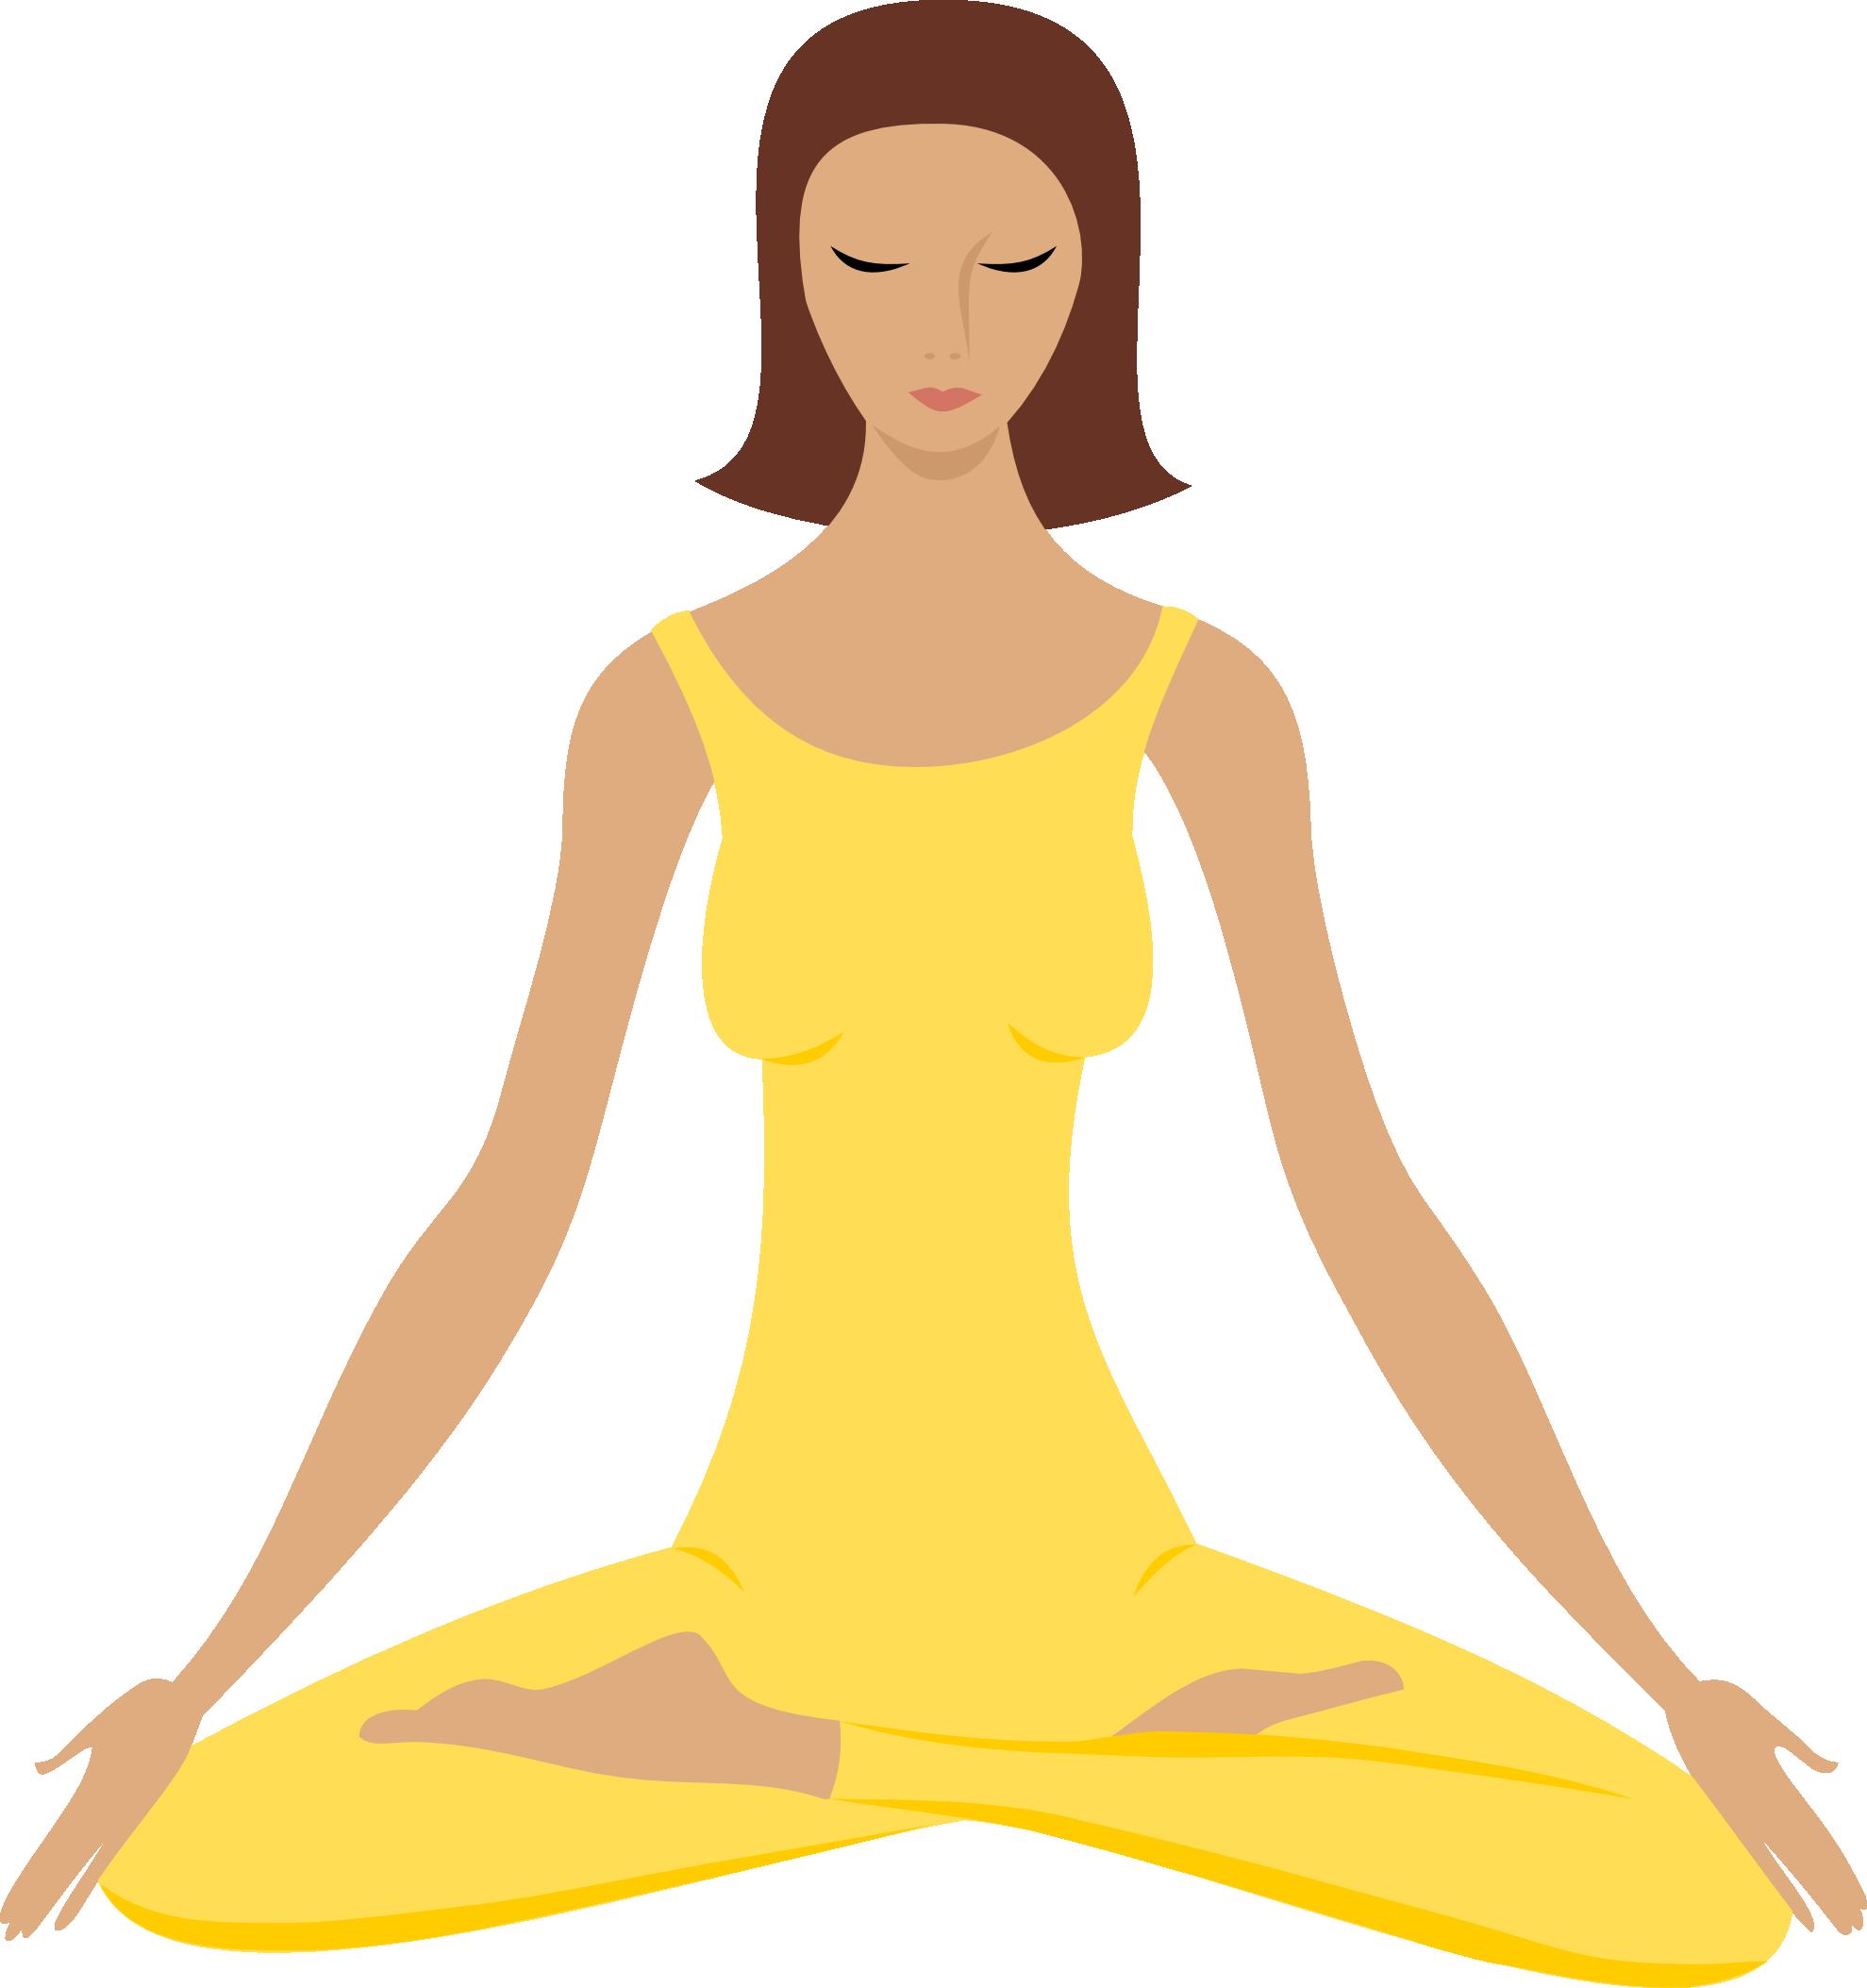 Clipart exercise stretches. Blog meditationclipartmeditationpx